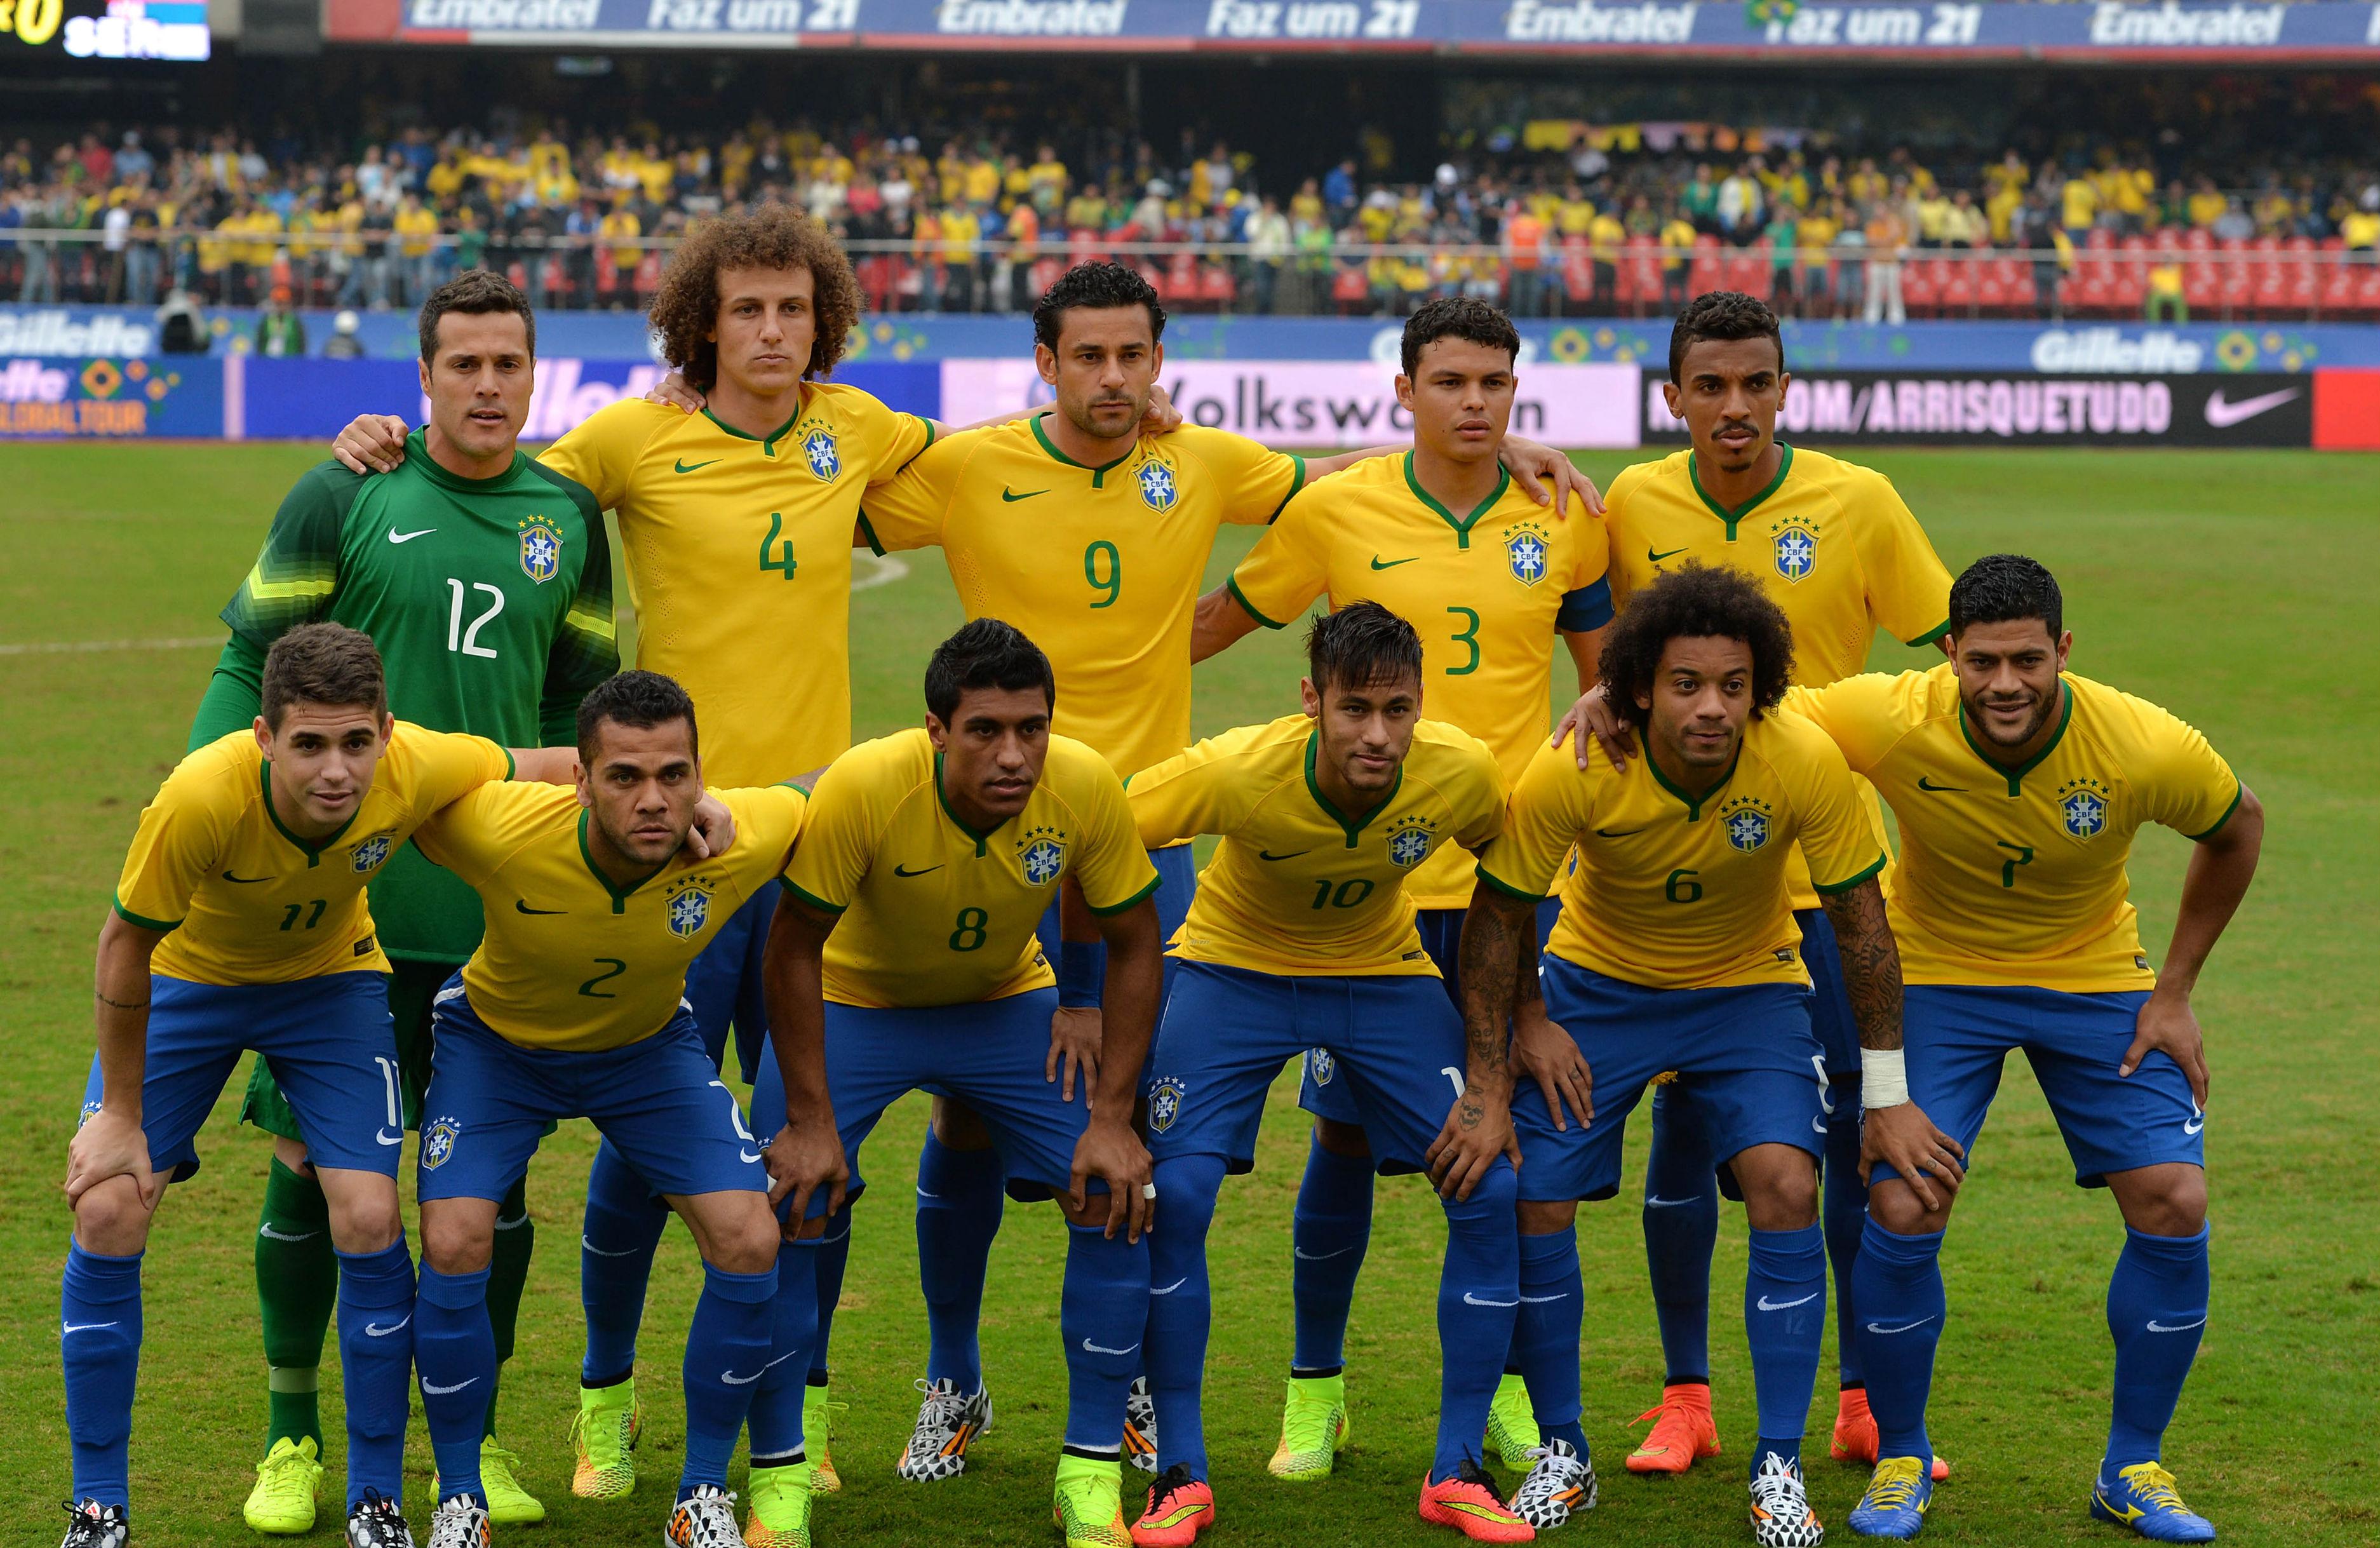 brazilteam_cc_img.jpg